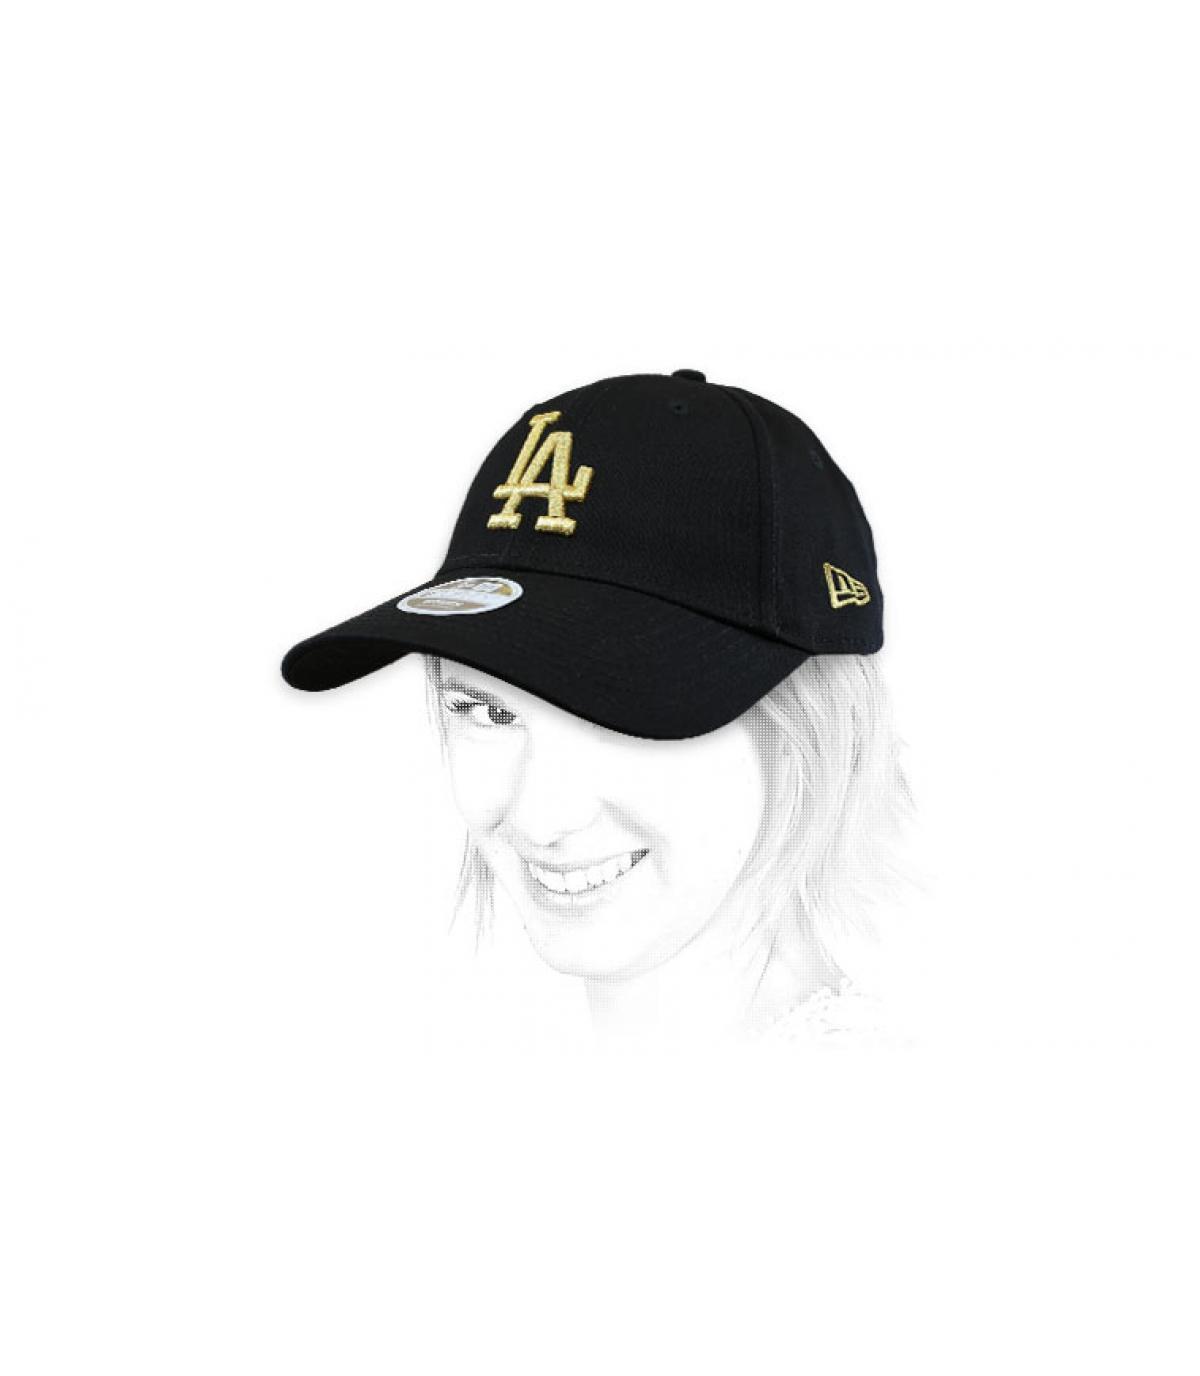 gorra mujer LA negro oro